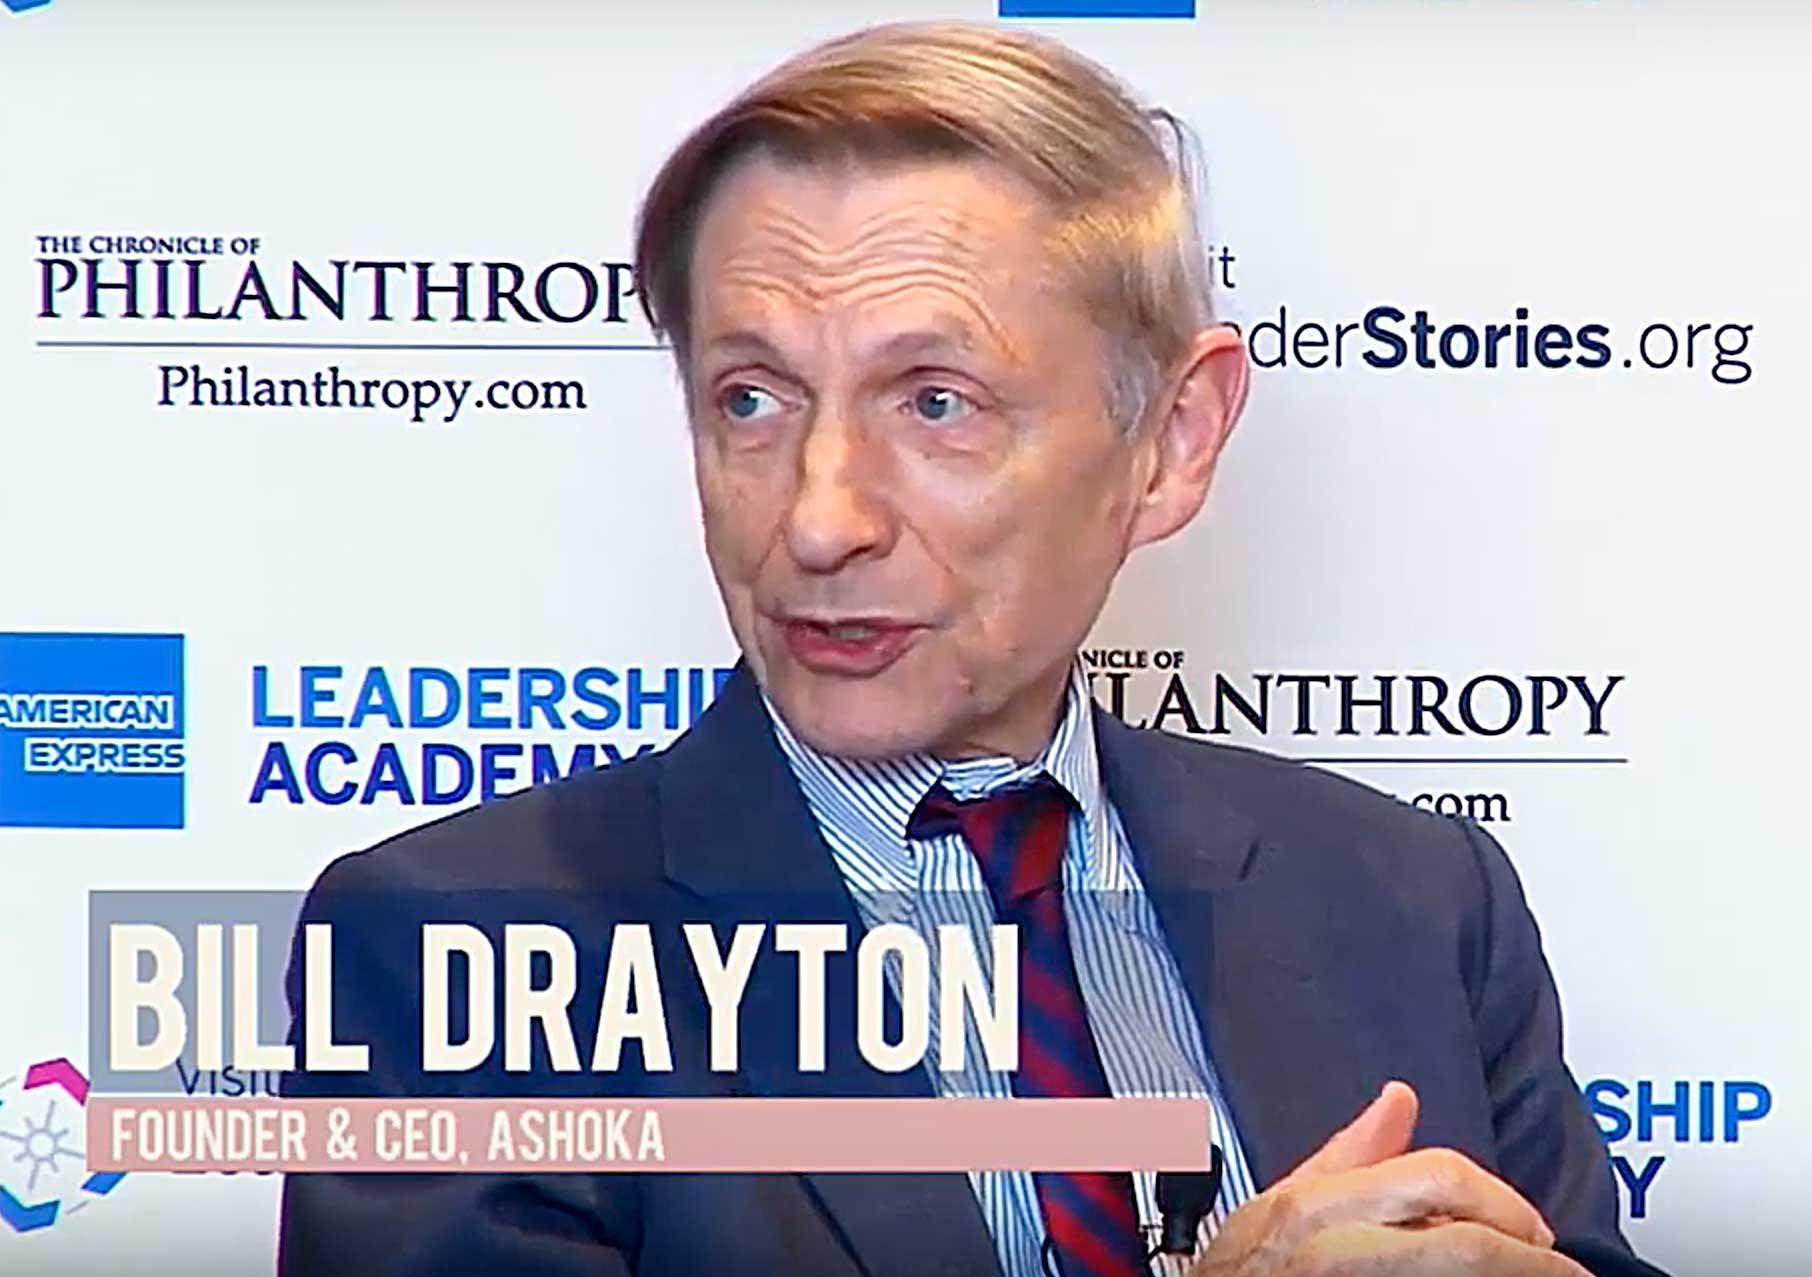 Bill Drayton Amex